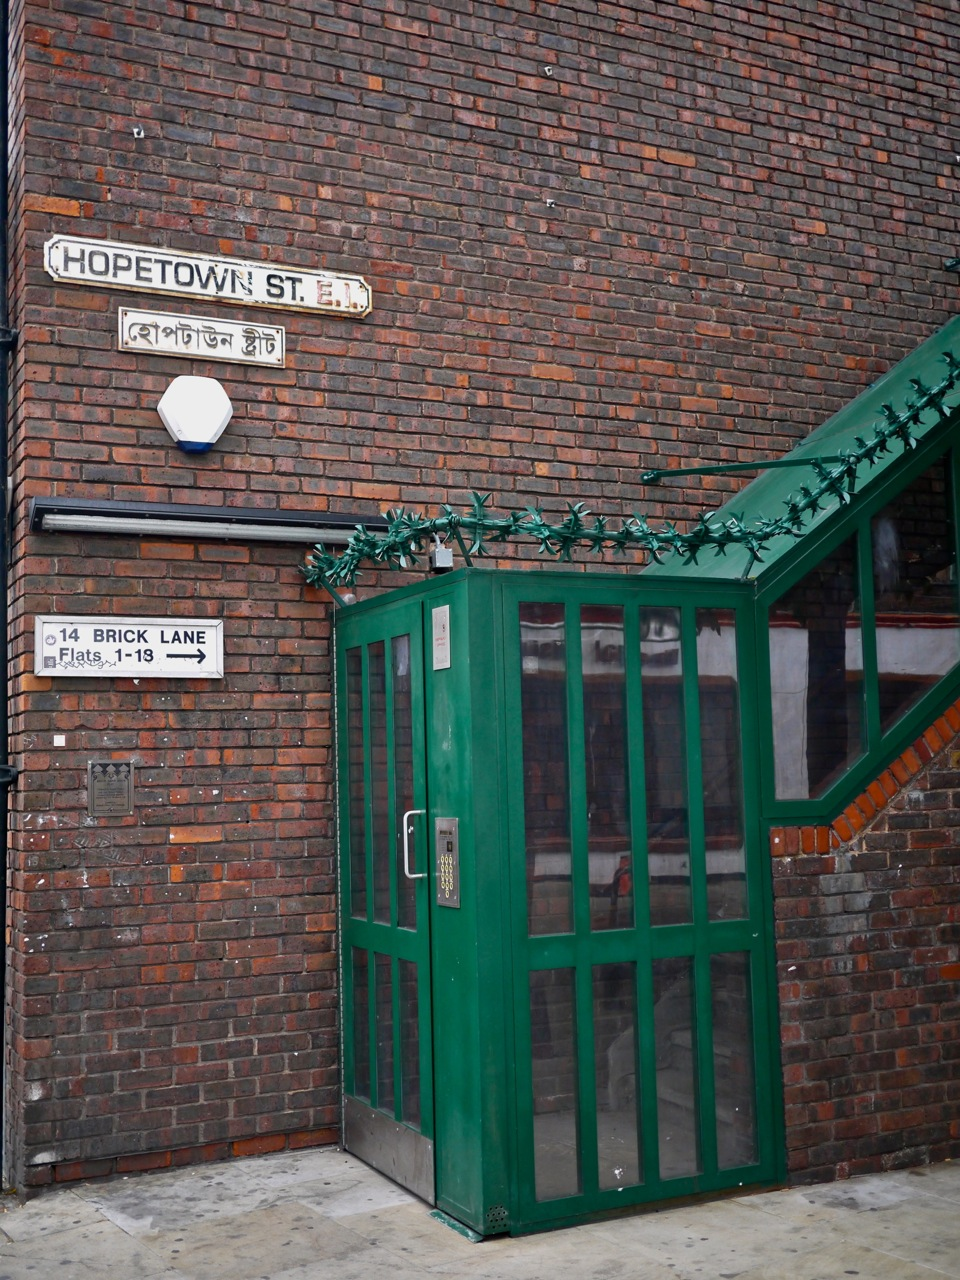 Brick Lane: Exploring Brick Lane On A Sunday Afternoon